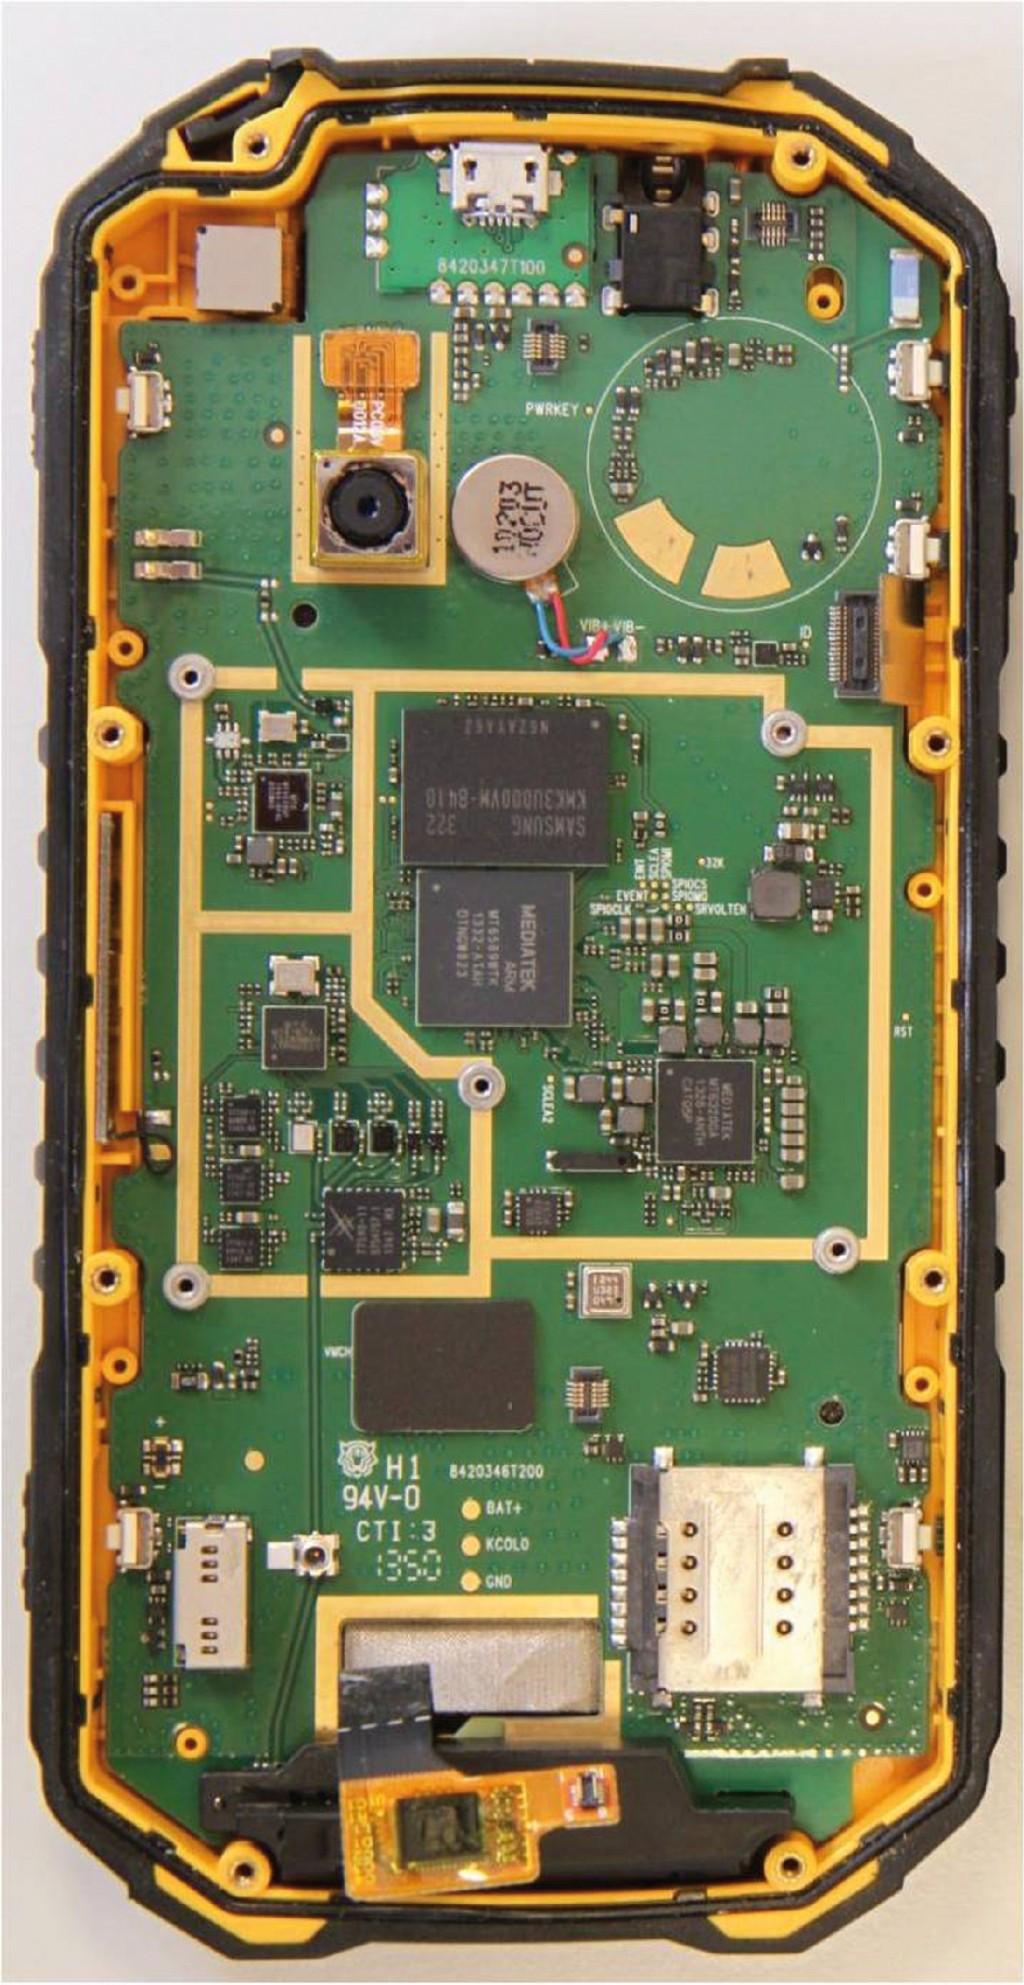 Bild 3 Hauptplatine eines Smartphones. Quelle: PTB